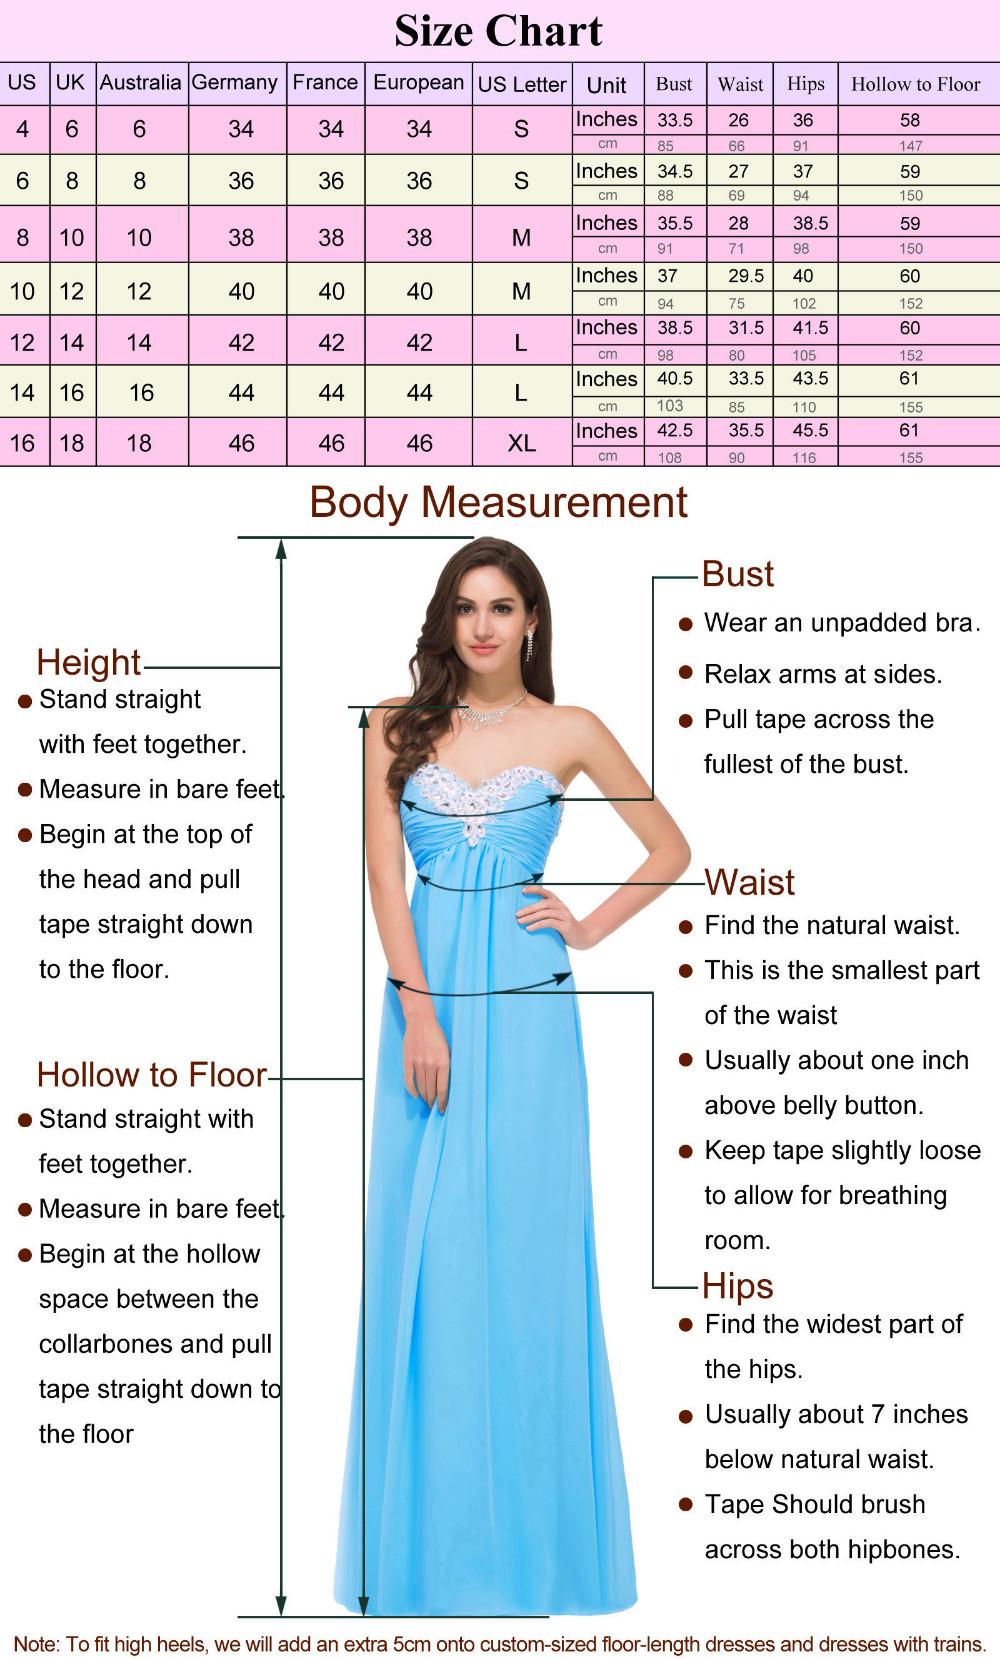 HTB16EW5OpXXXXaXXFXXq6xXFXXX4Long Formal Dress Elegant Floor Length Chiffon Dress